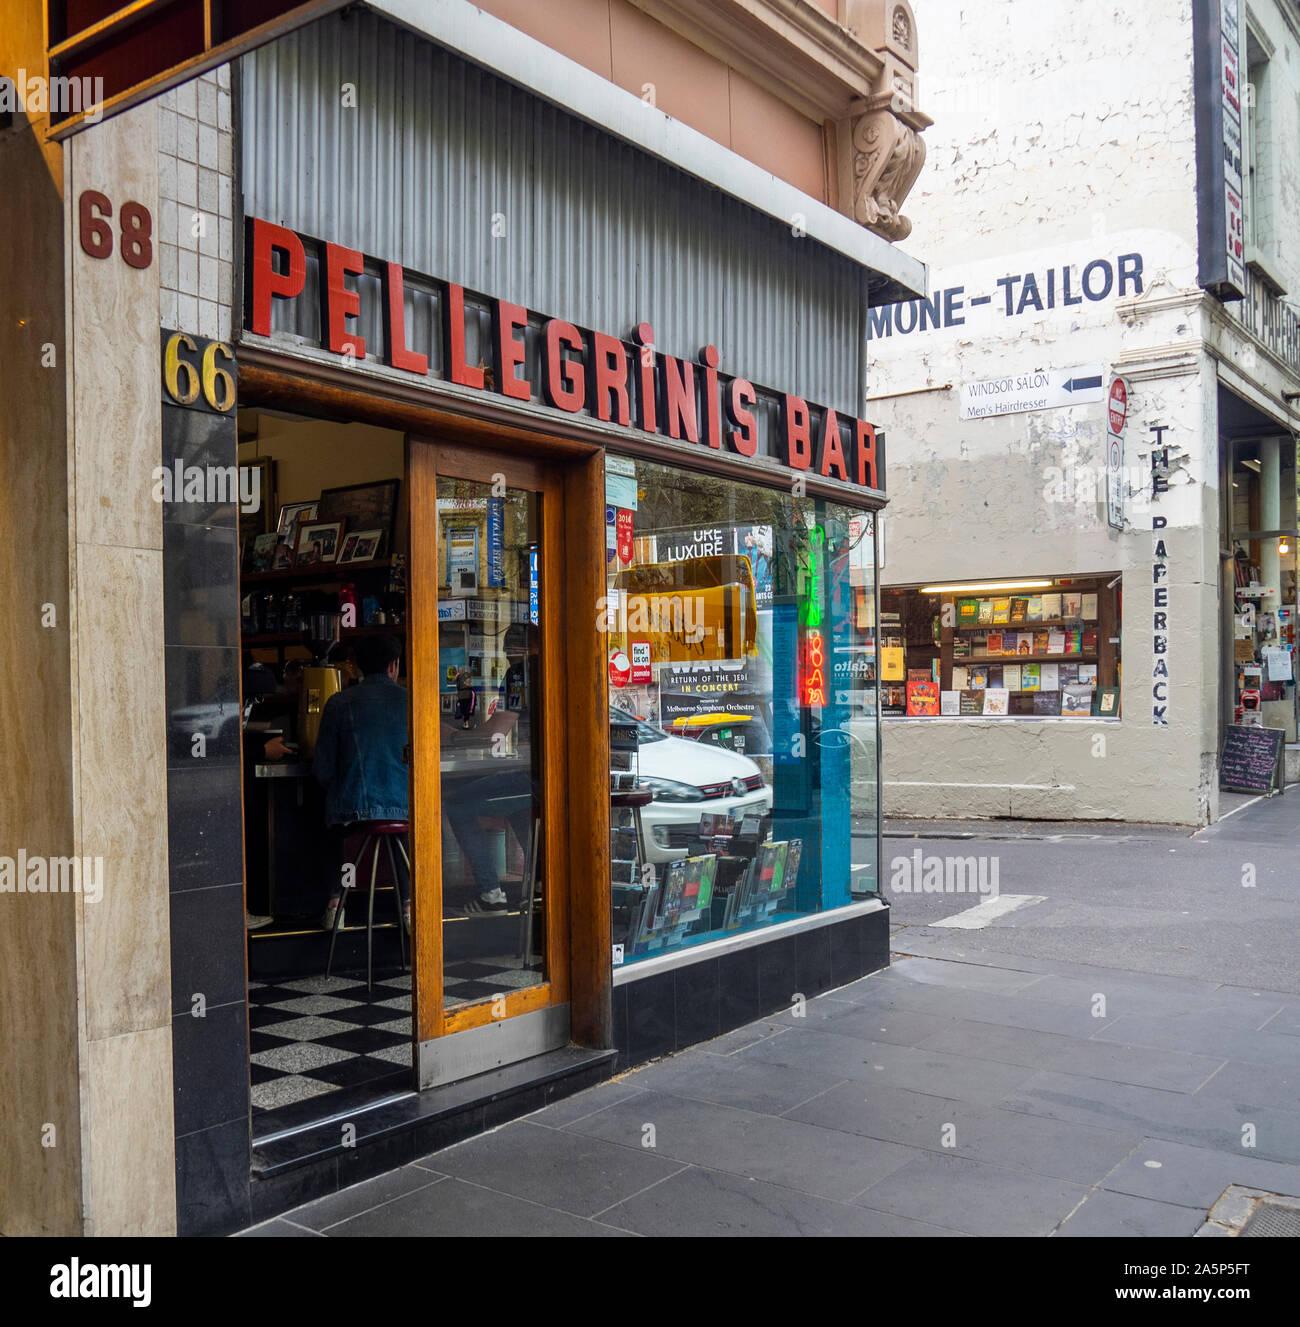 iconic-landmark-pelligrinis-bar-and-restaurant-on-bourke-street-melbourne-victoria-australia-2A5P5FT.jpg